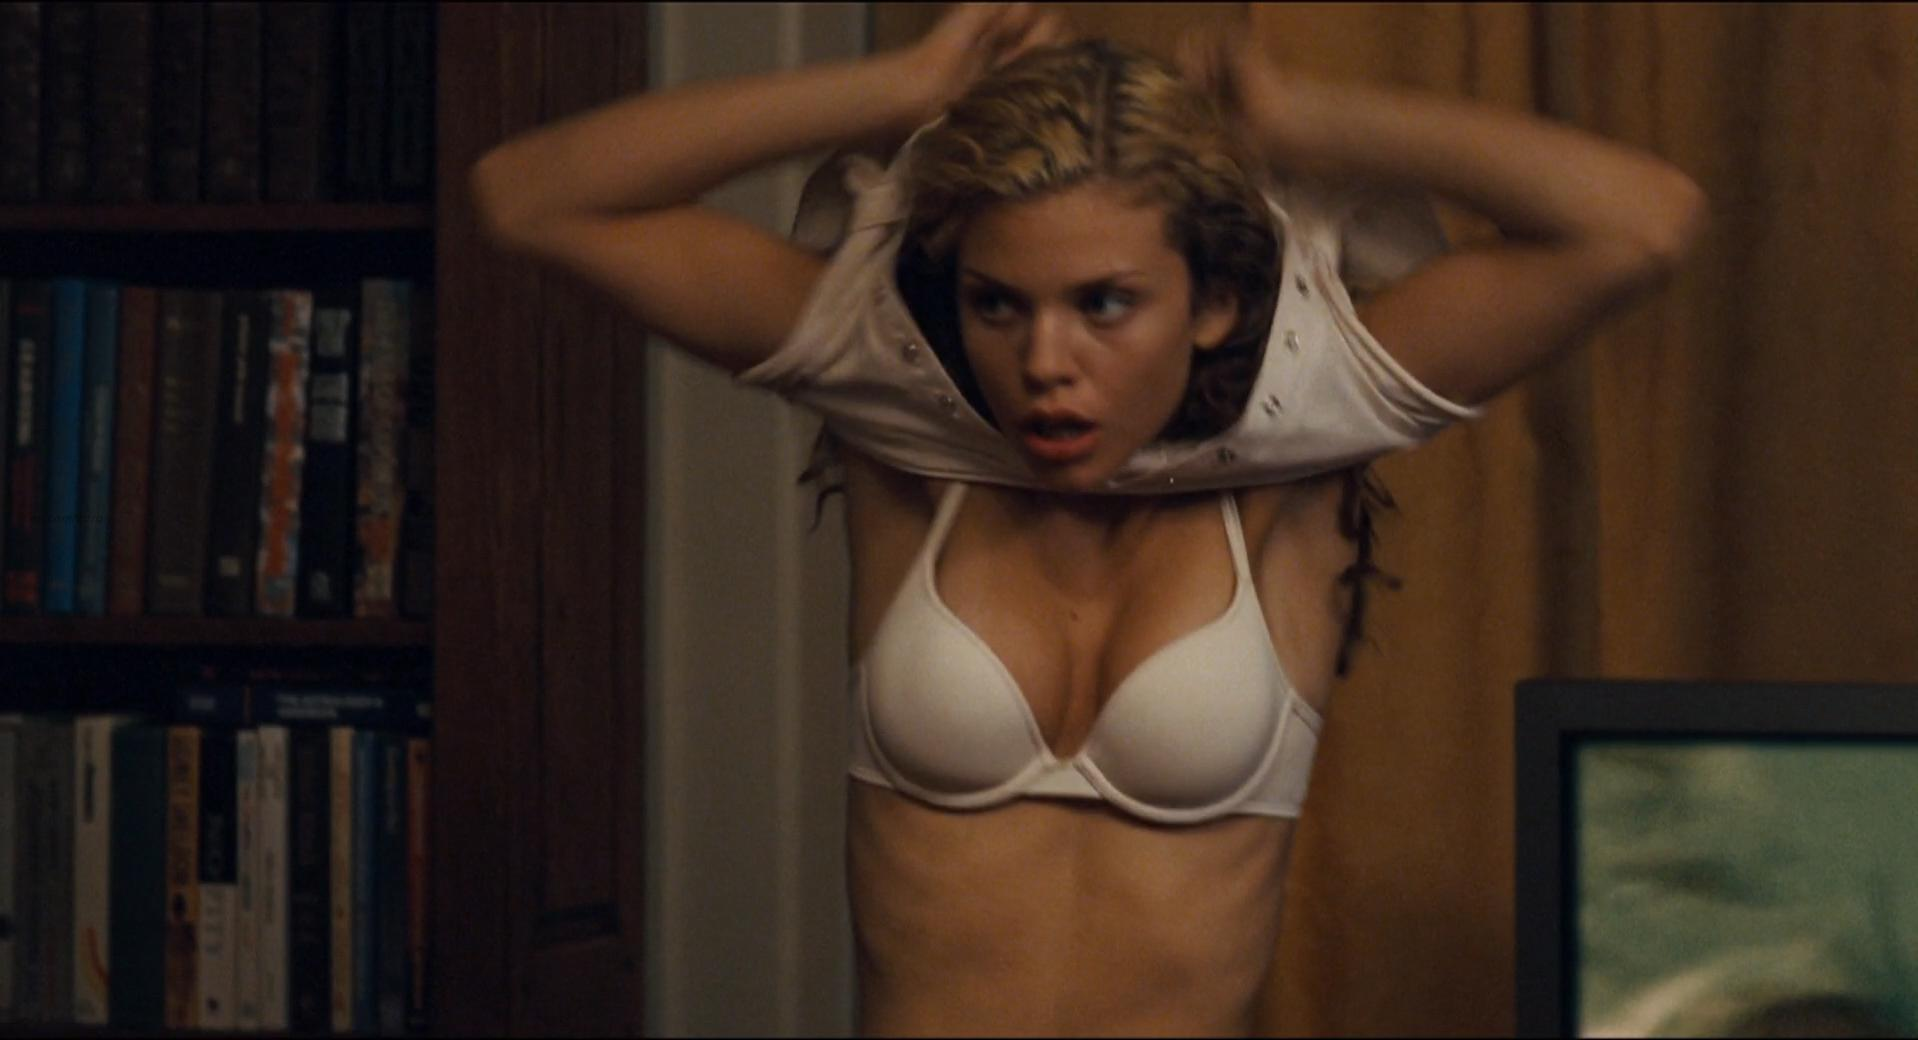 Andrea Osvárt Nuda nude video celebs » butt - page 192